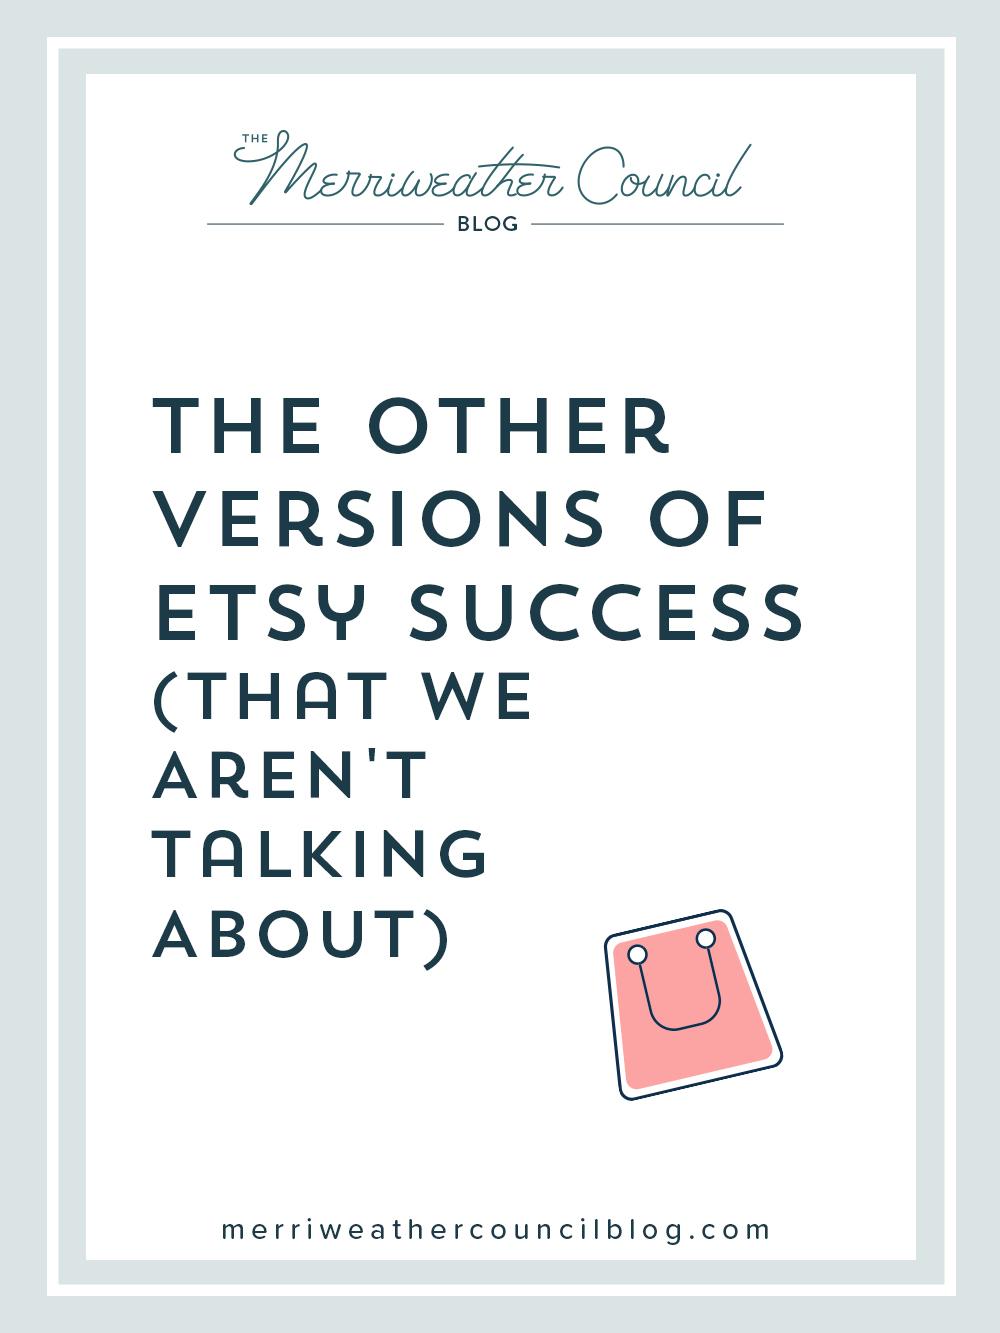 etsy success | the merriweather council blog